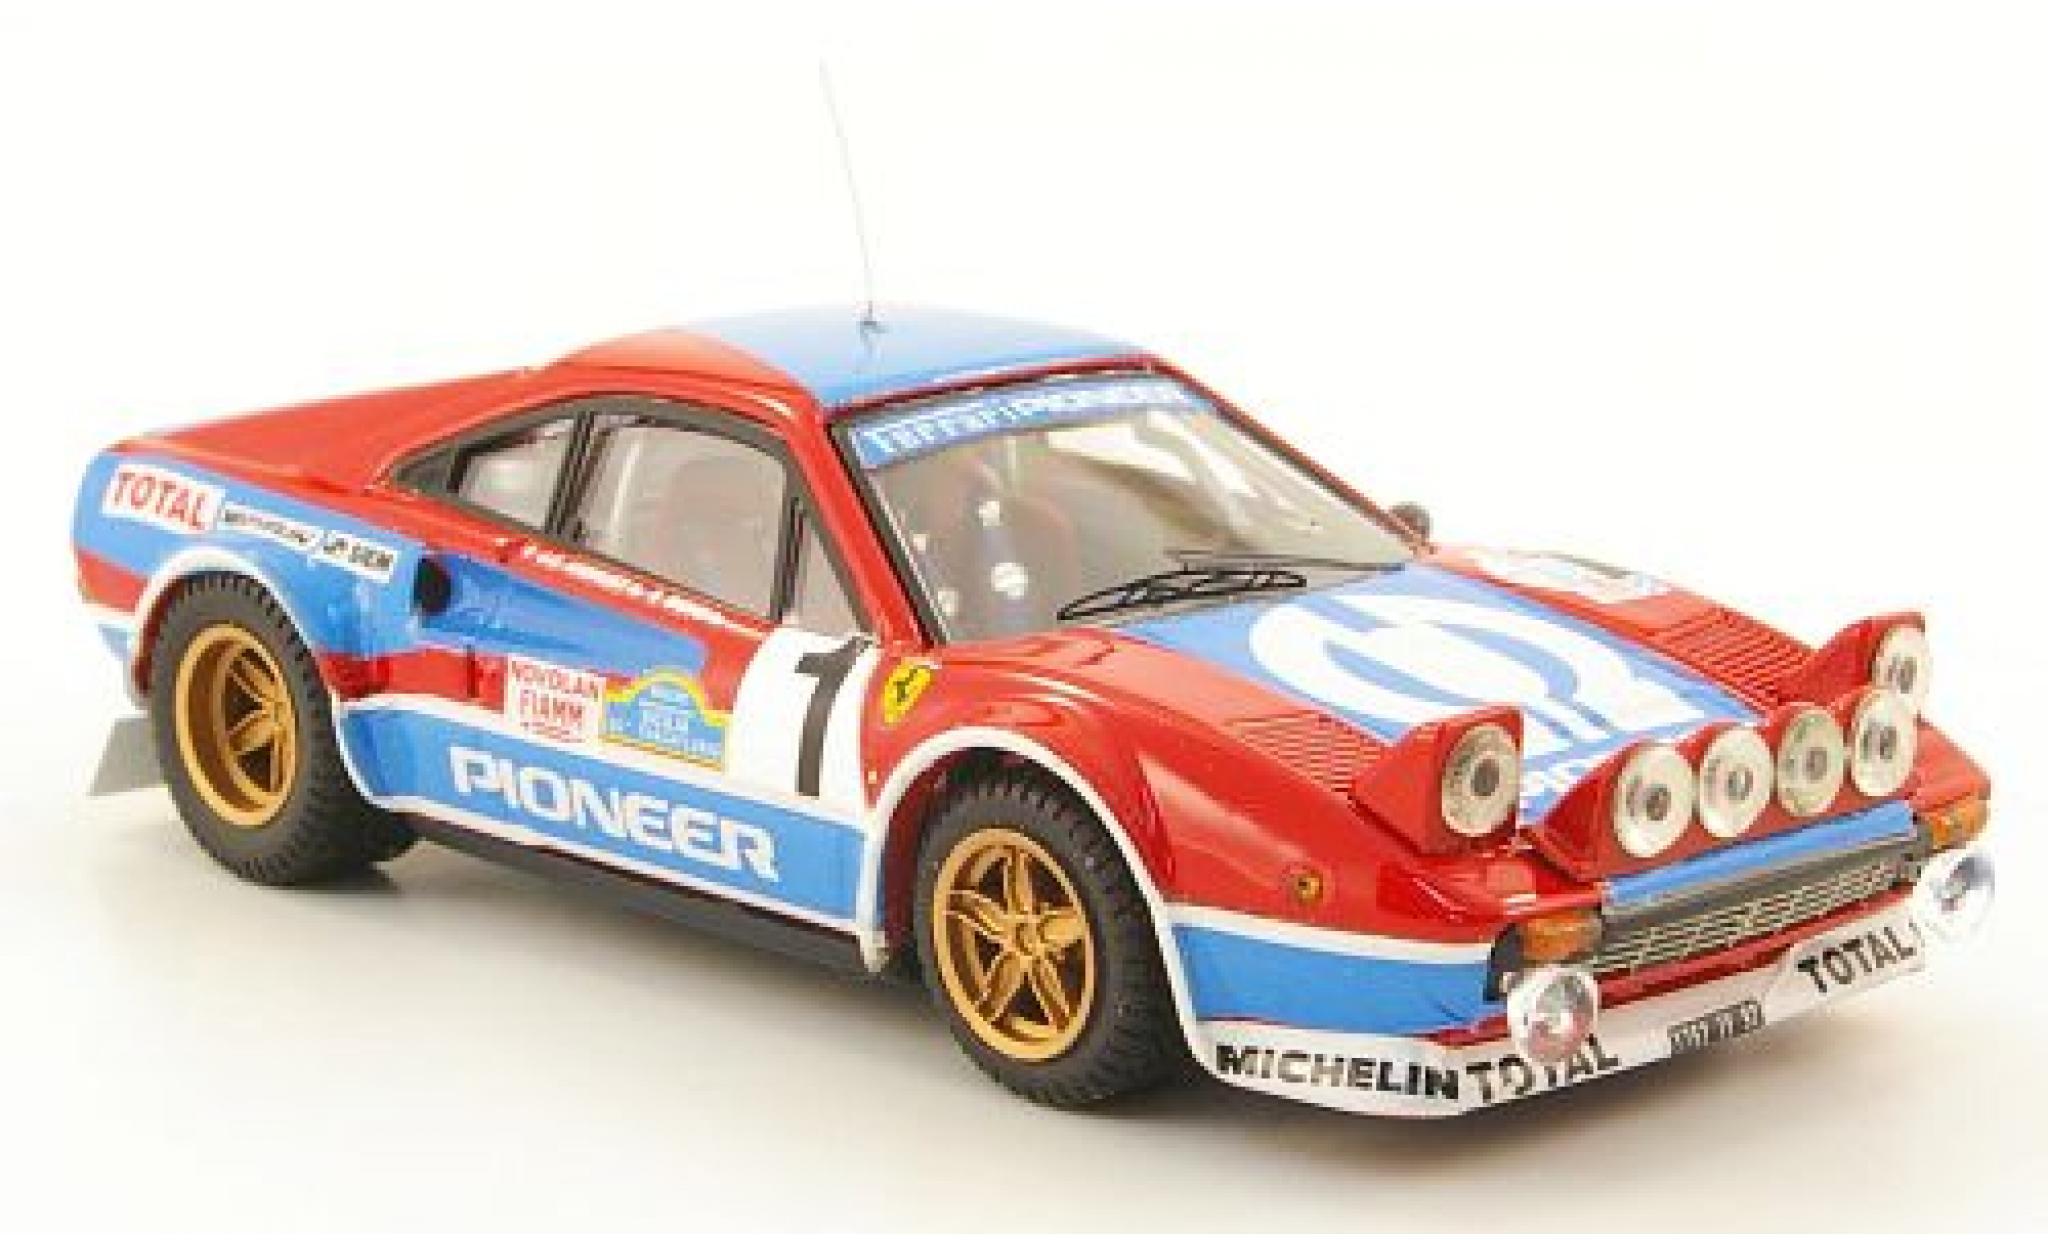 Ferrari 308 1/43 Best Gr.4 No.4 Pioneer Targa Florio 1982 J.C.Andreut/Biche